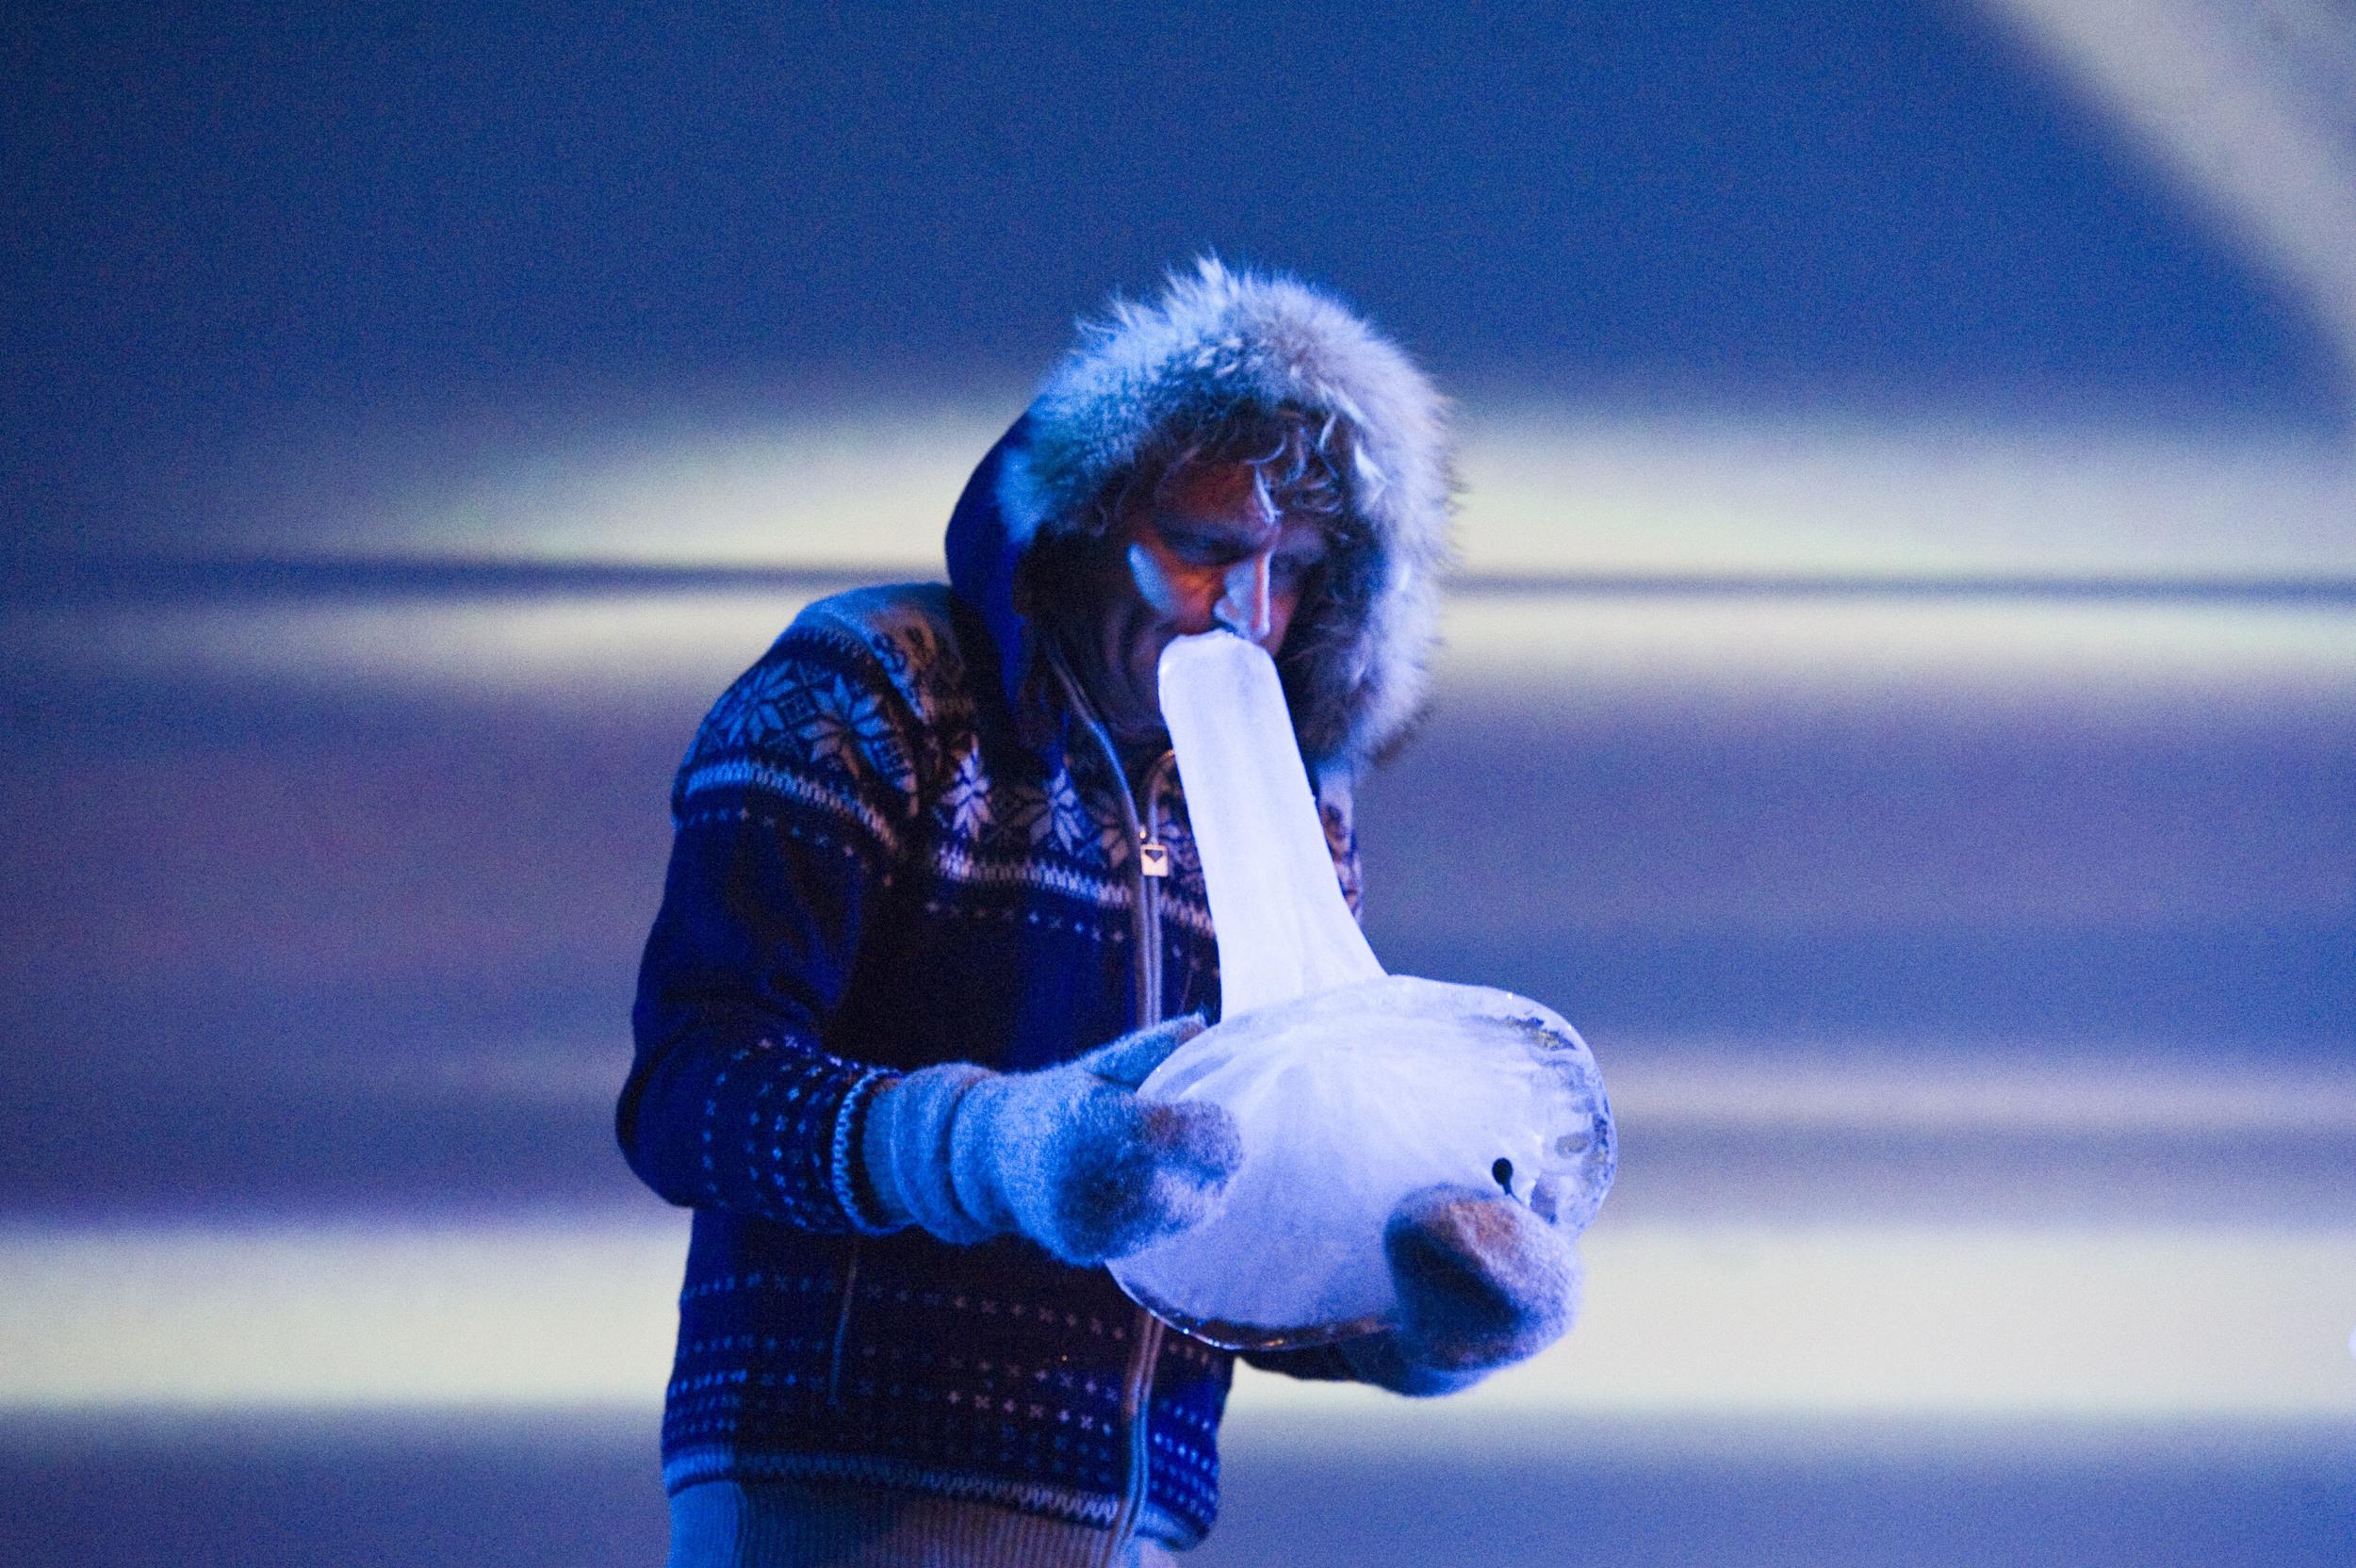 Geir Birkeland Arctic MusicDSC_2279.jpg